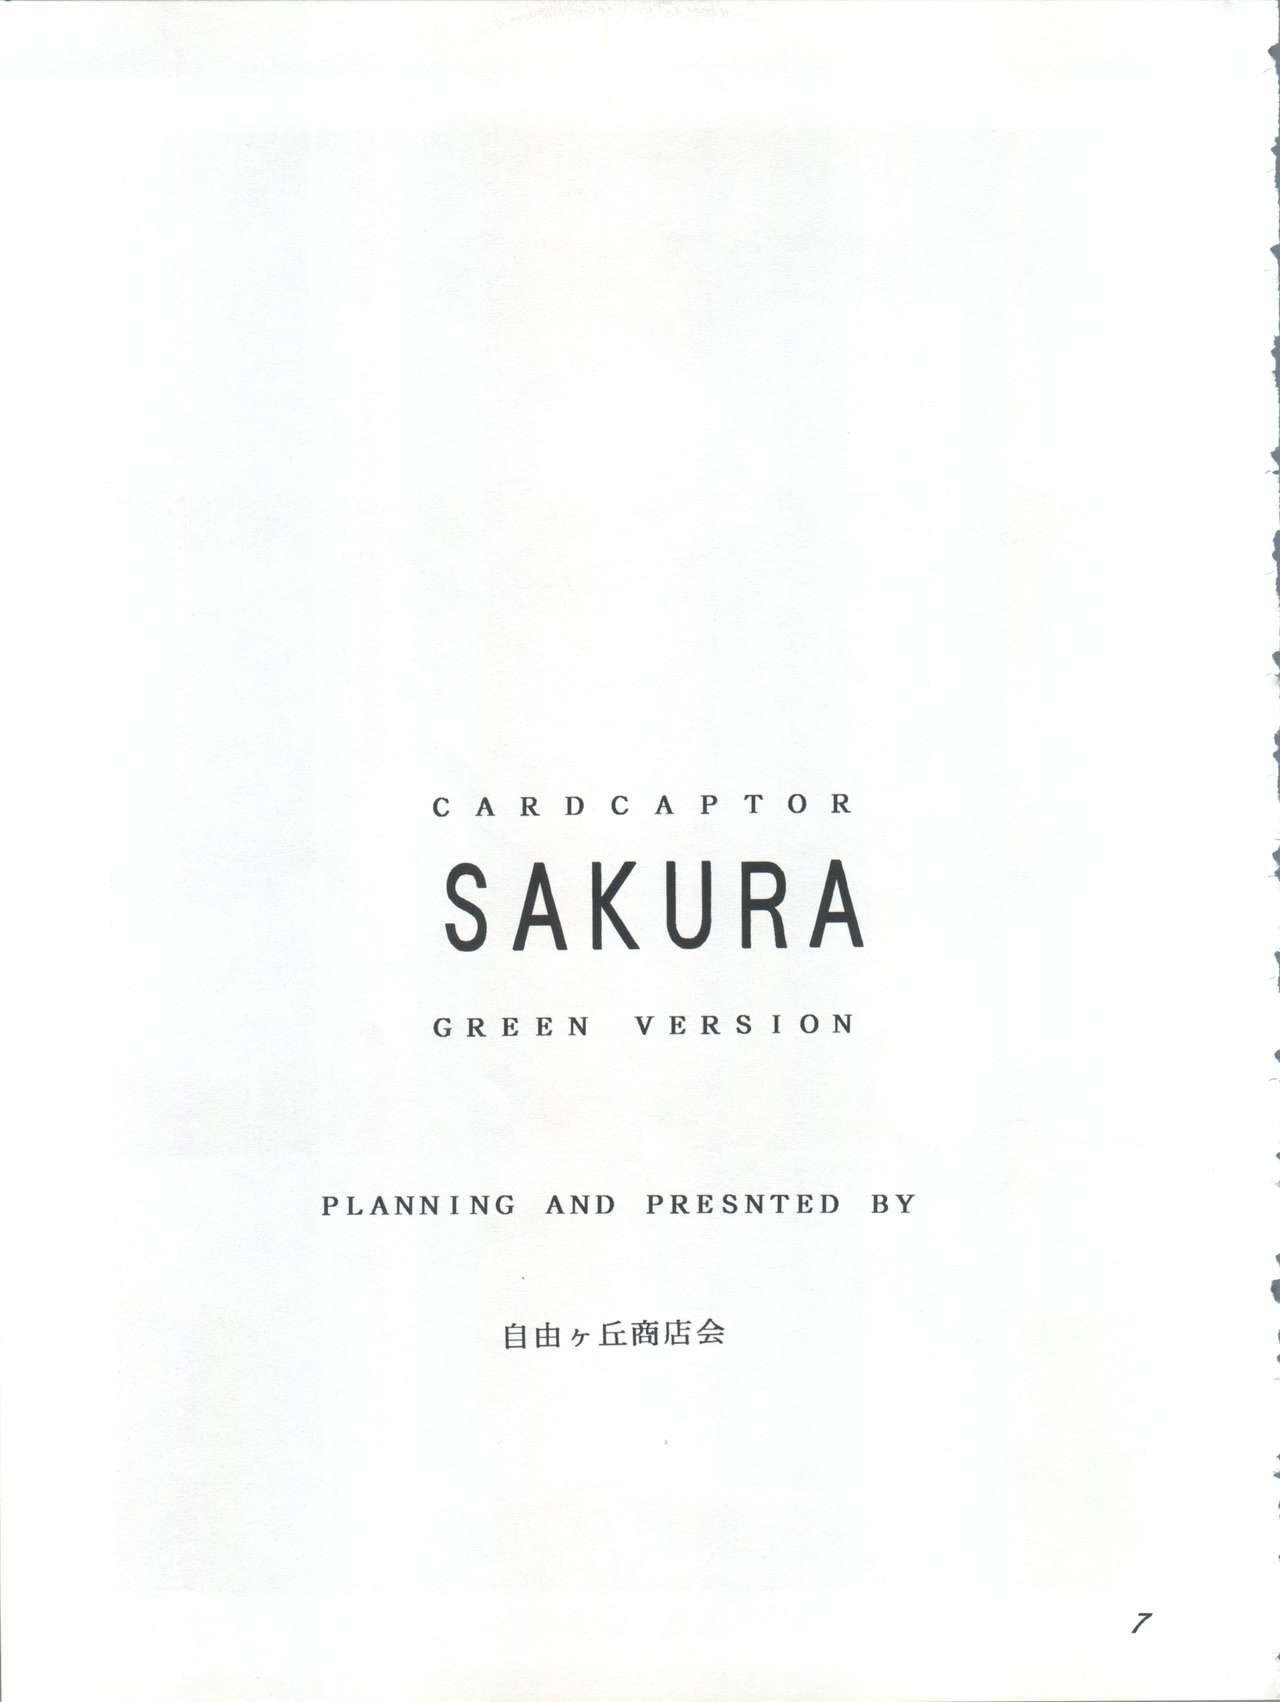 Card Captor Sakura Act 3 Green Version 6